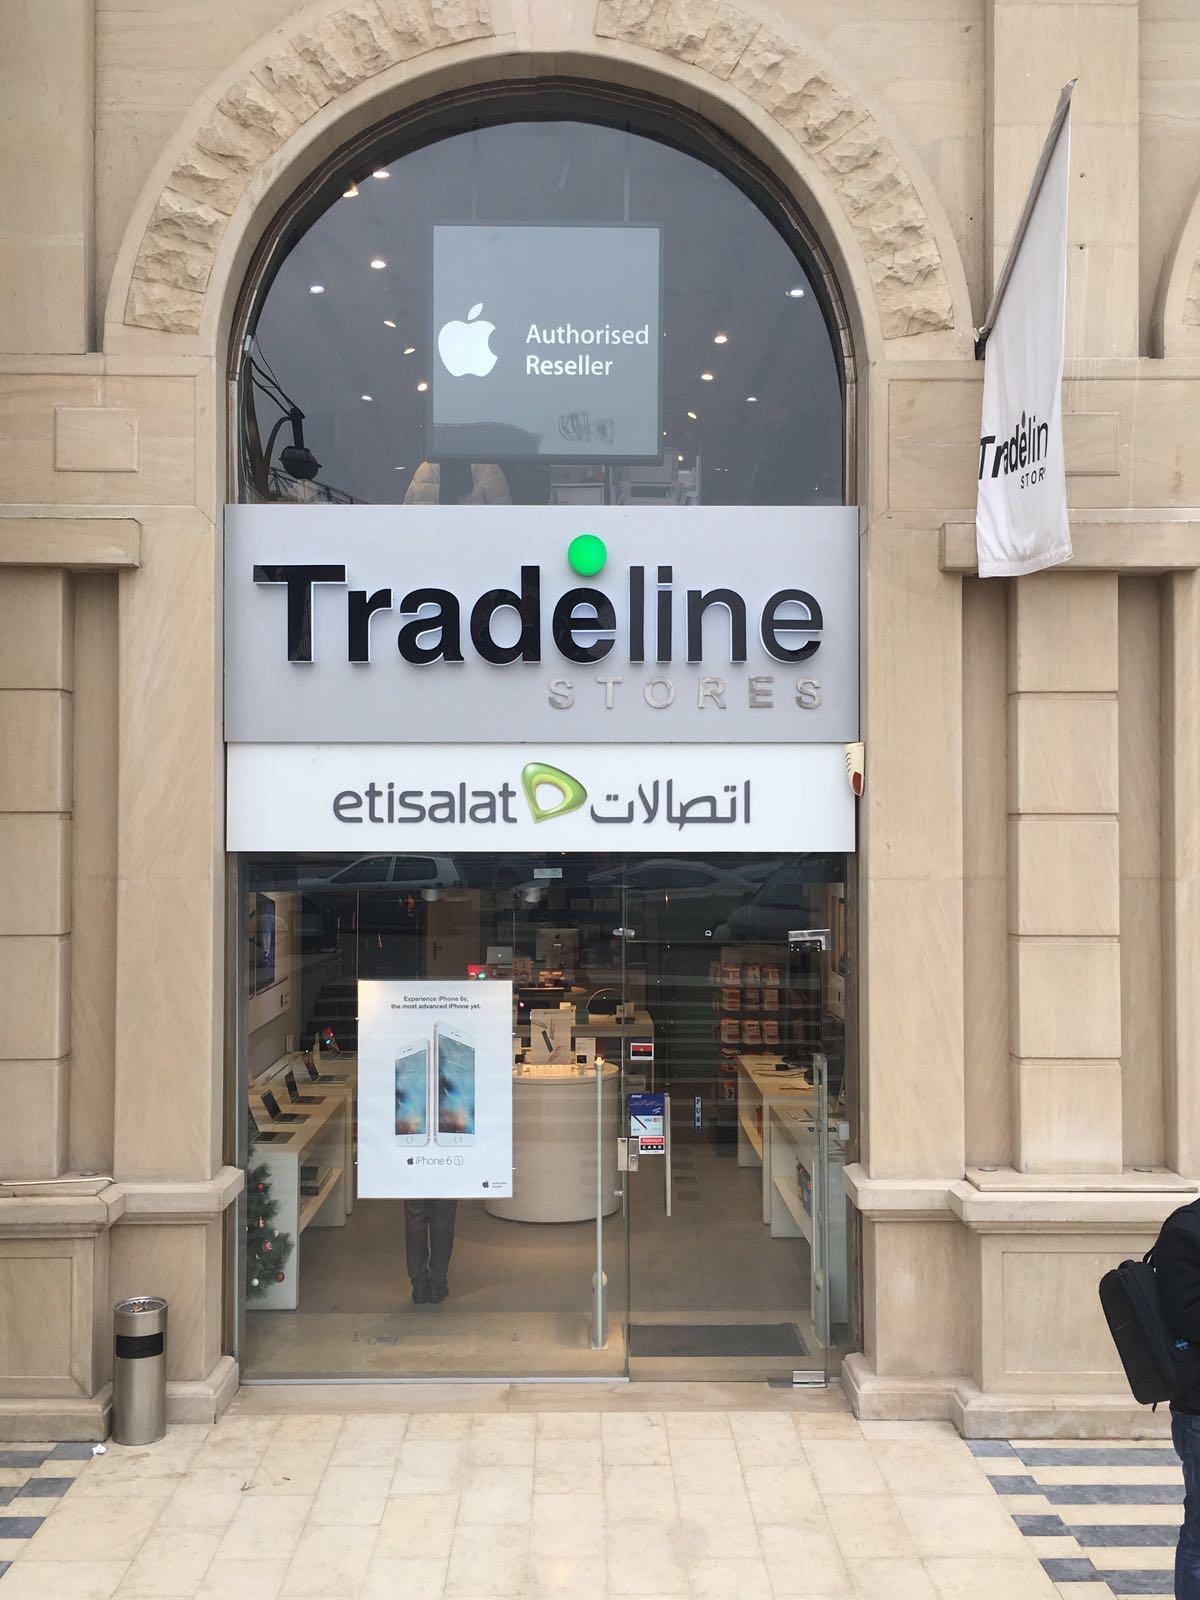 Tradeline Tradeline stores - Concord Plaza Mall - Kattameya